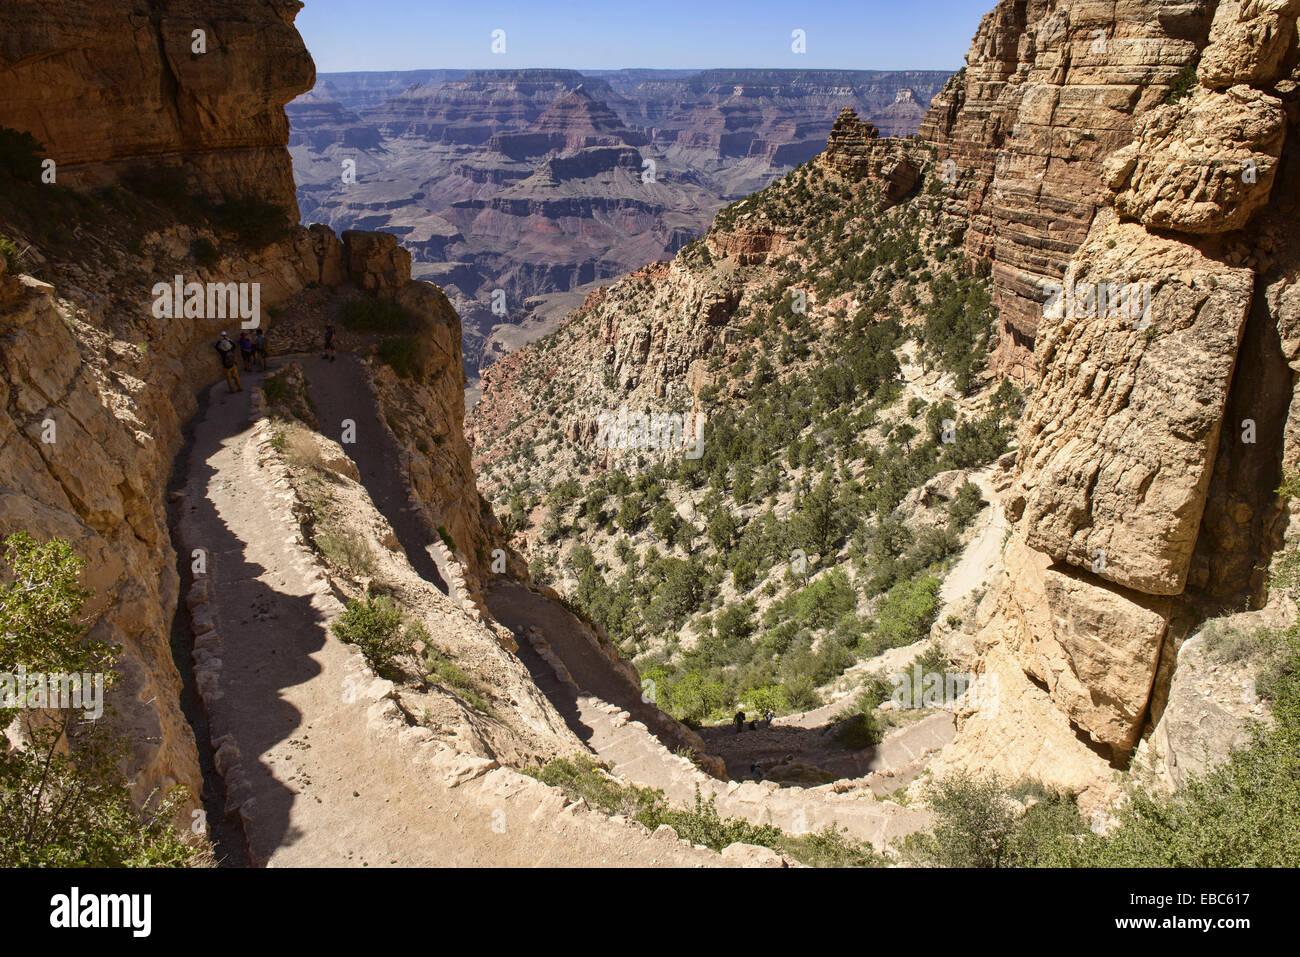 View down the Kaibab Trail, Grand Canyon National Park, Arizona. - Stock Image